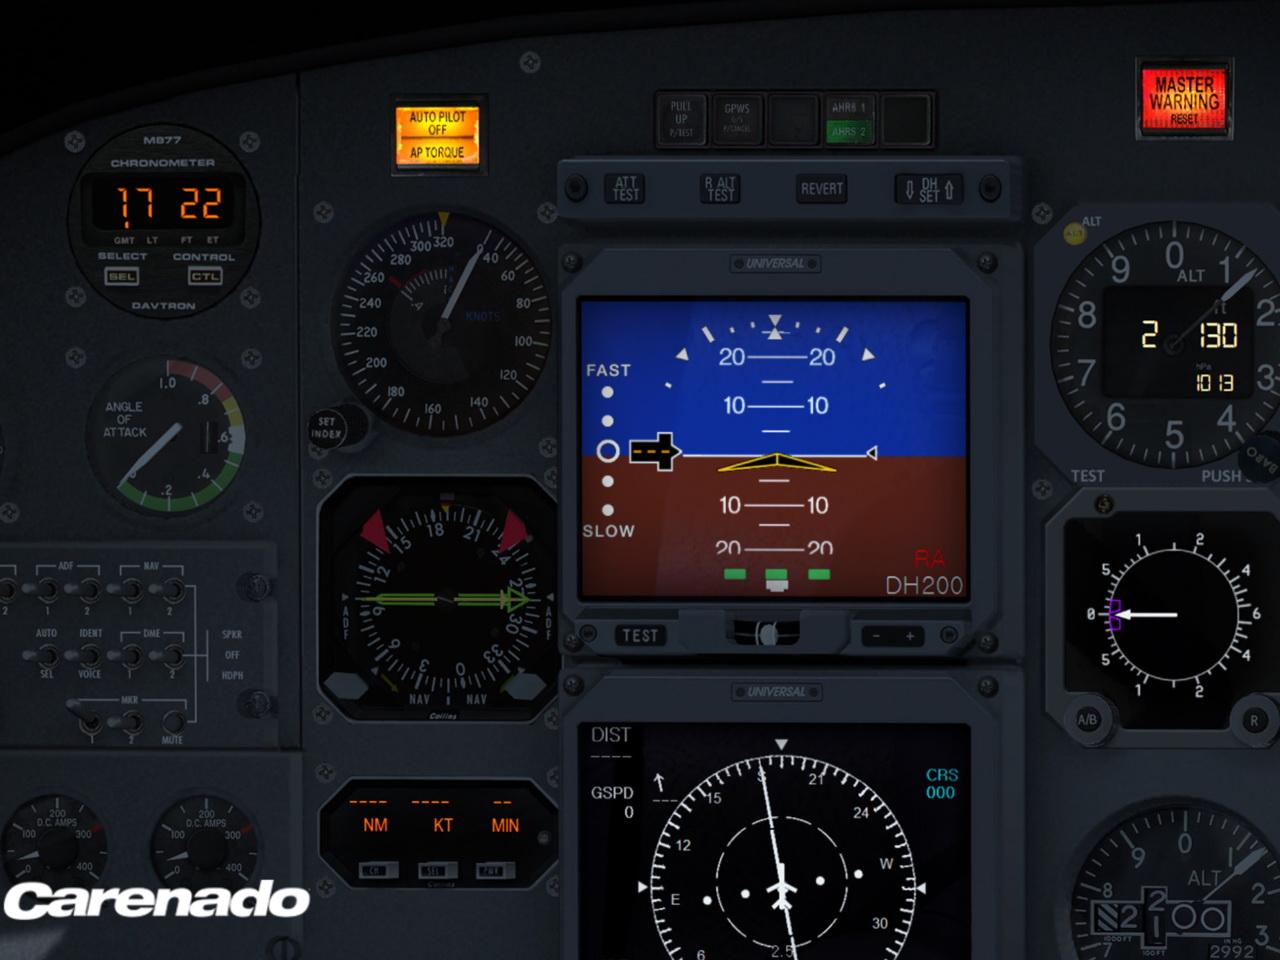 Carenado S550_2.jpg